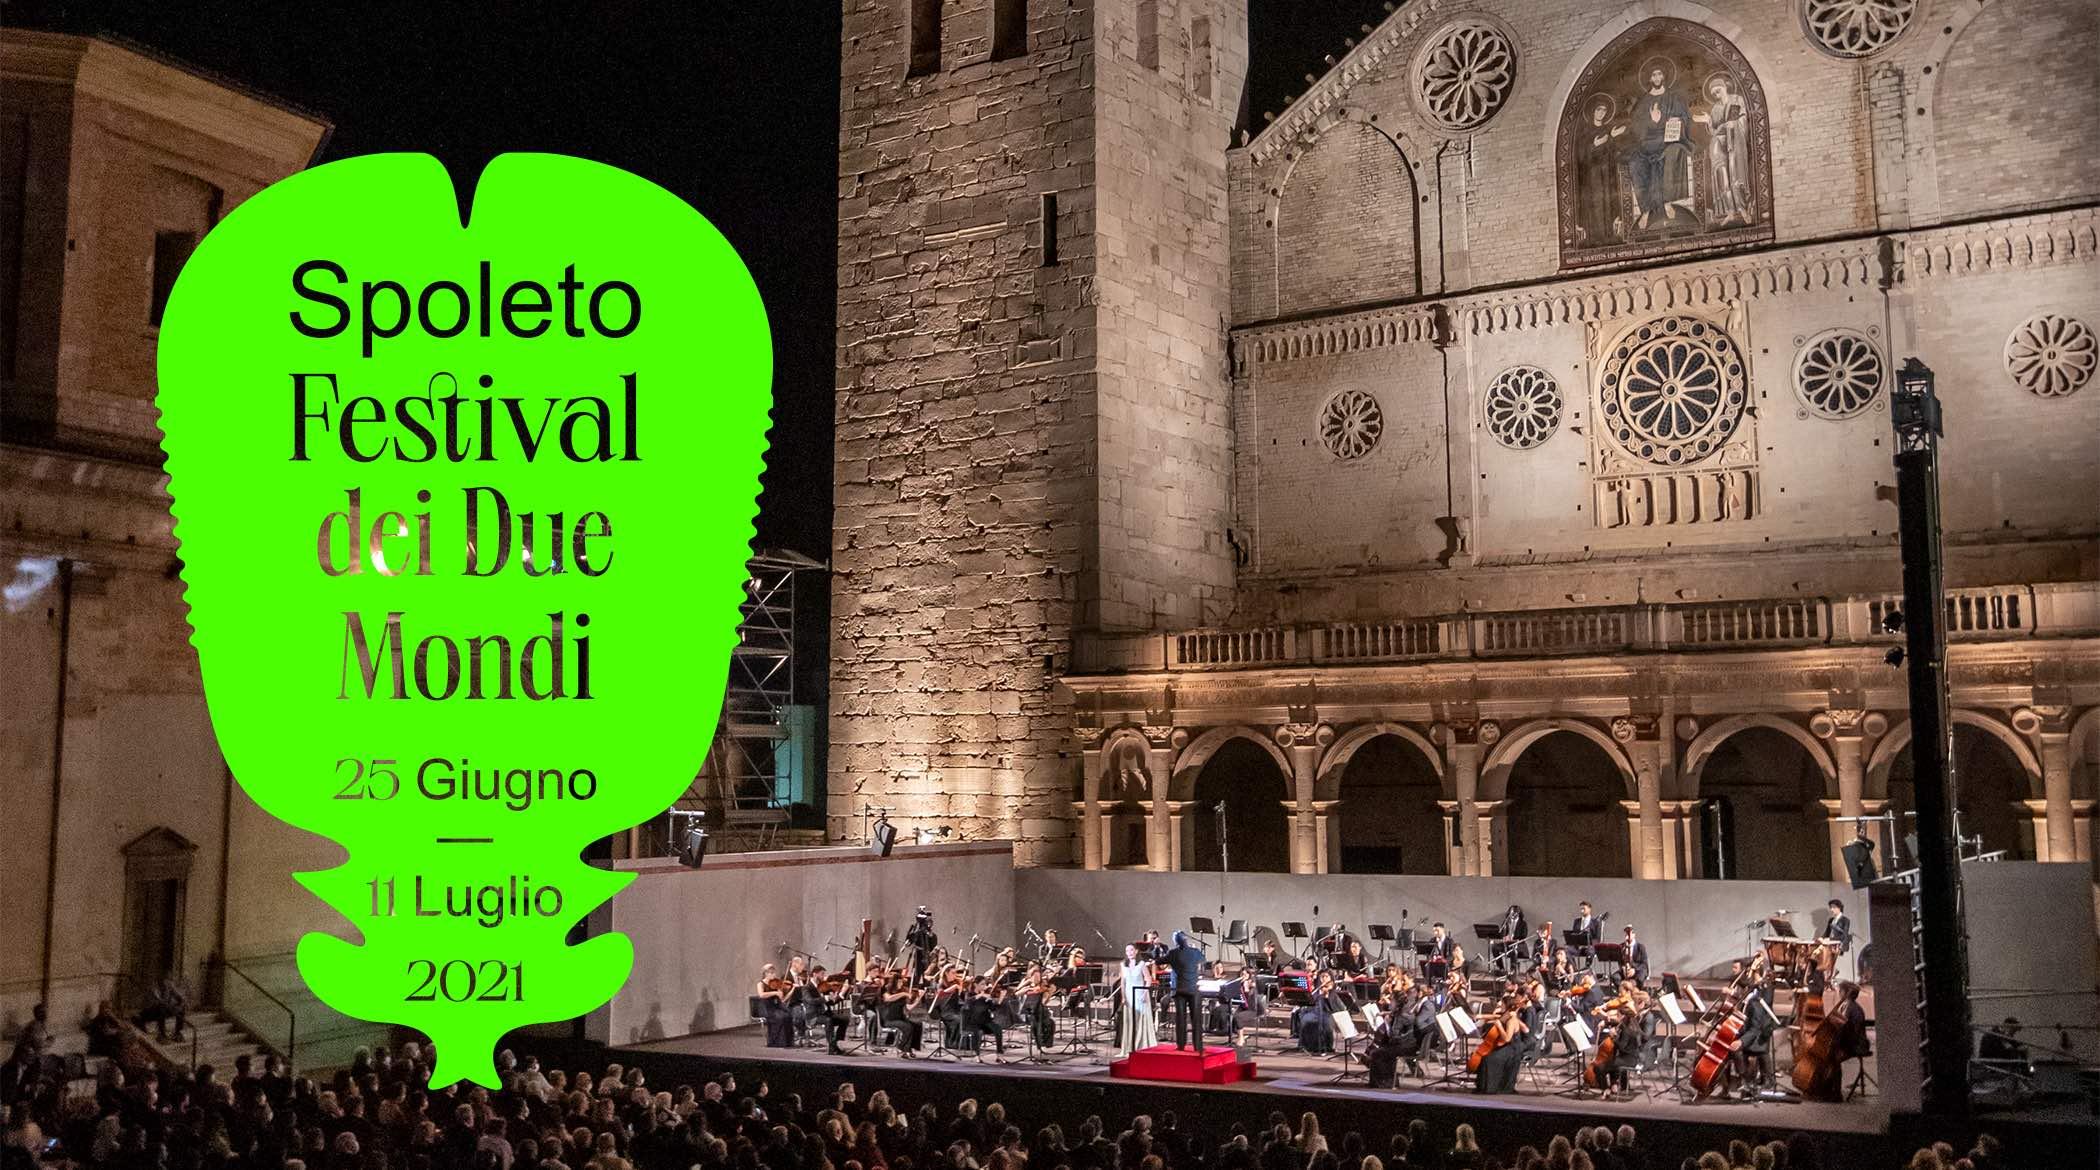 Spoleto64; Festival dei Due Monti; Spoleto 2021